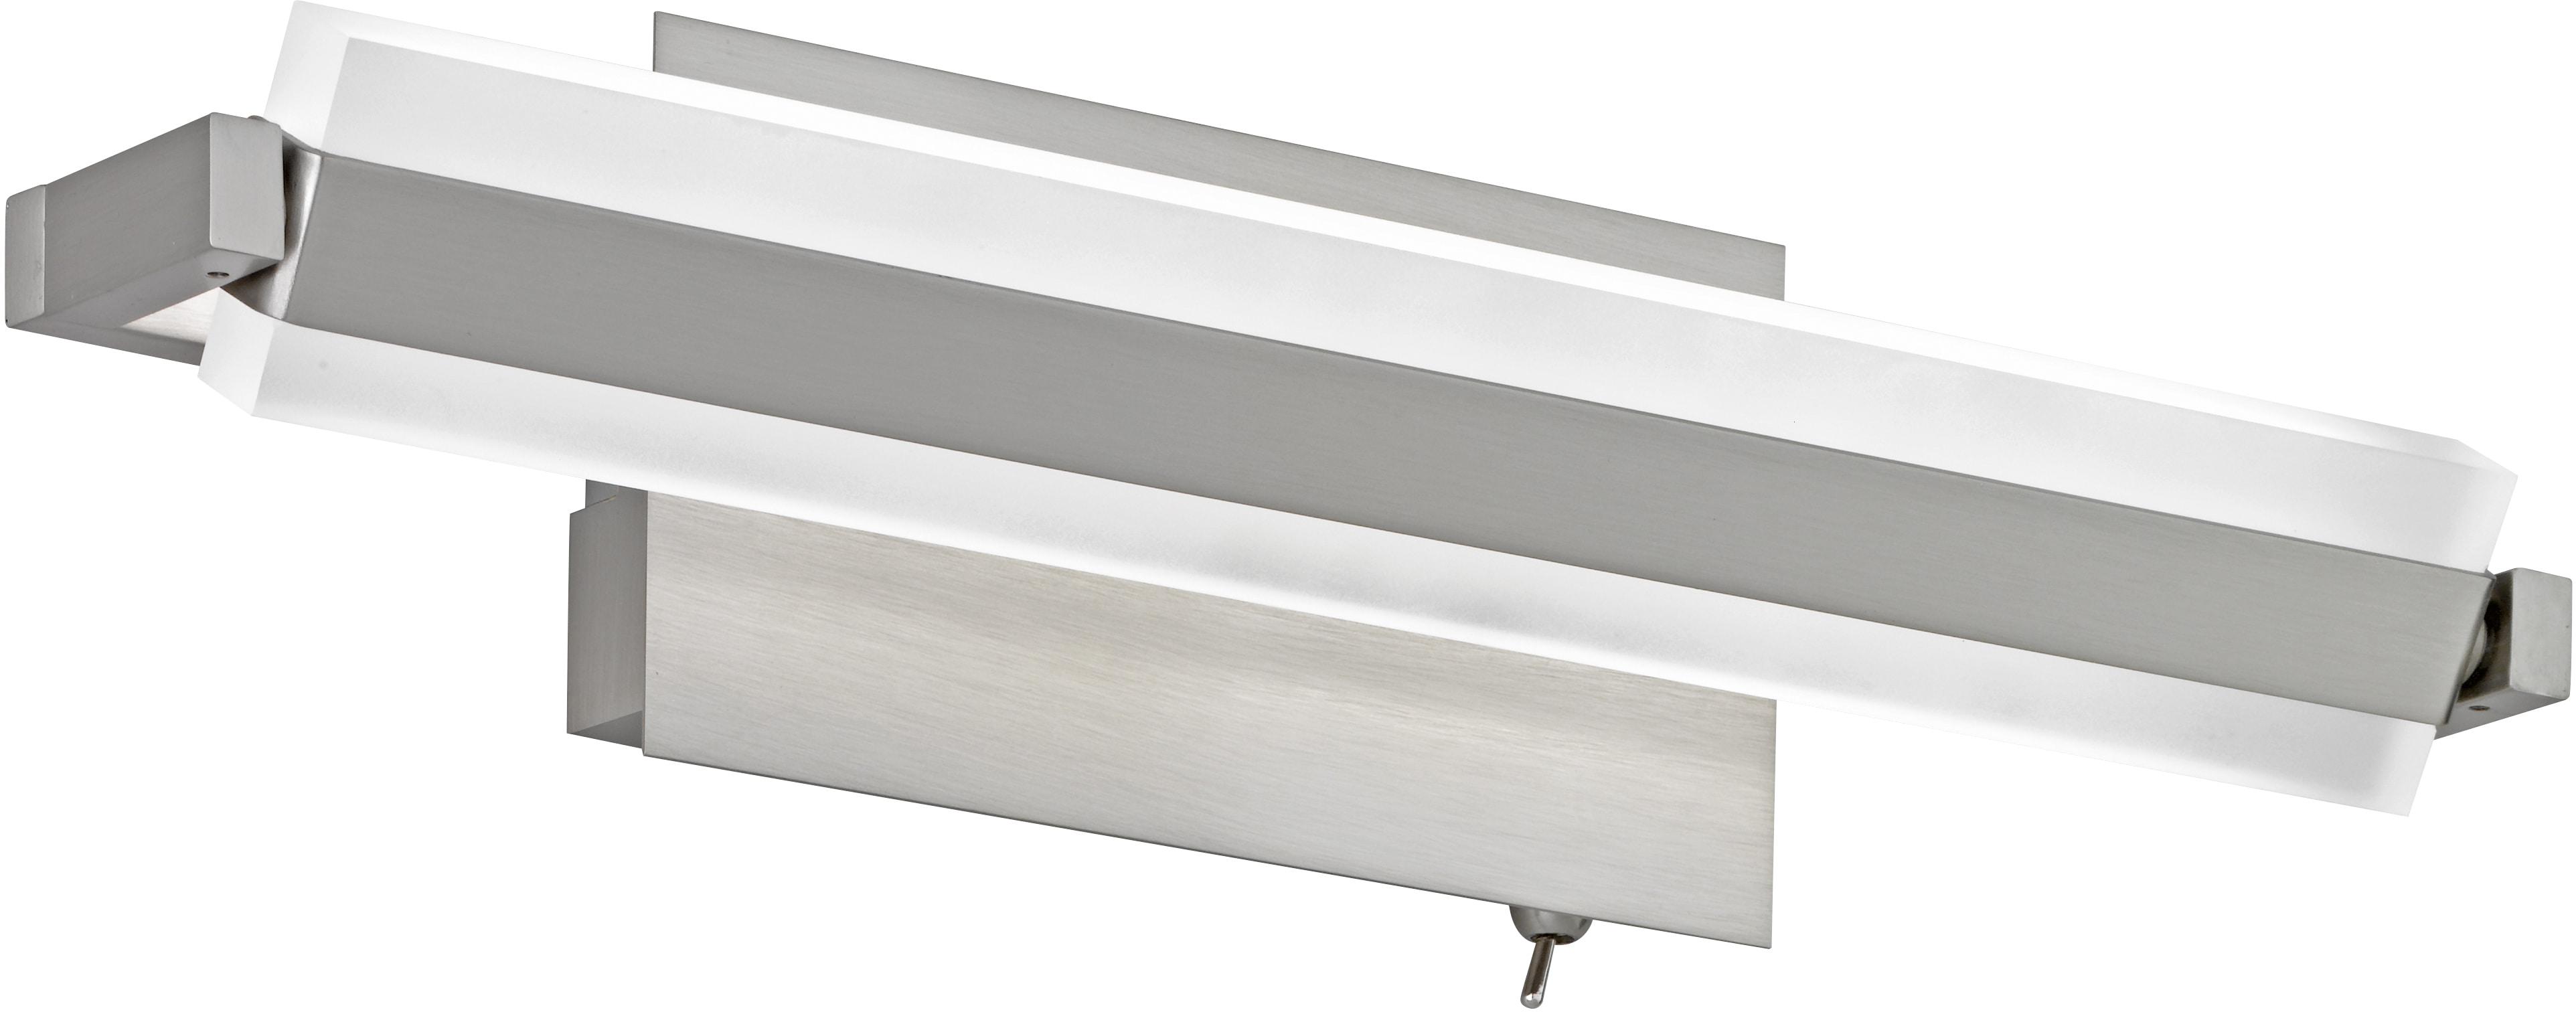 FISCHER & HONSEL LED Wandleuchte Turn, LED-Modul, Warmweiß